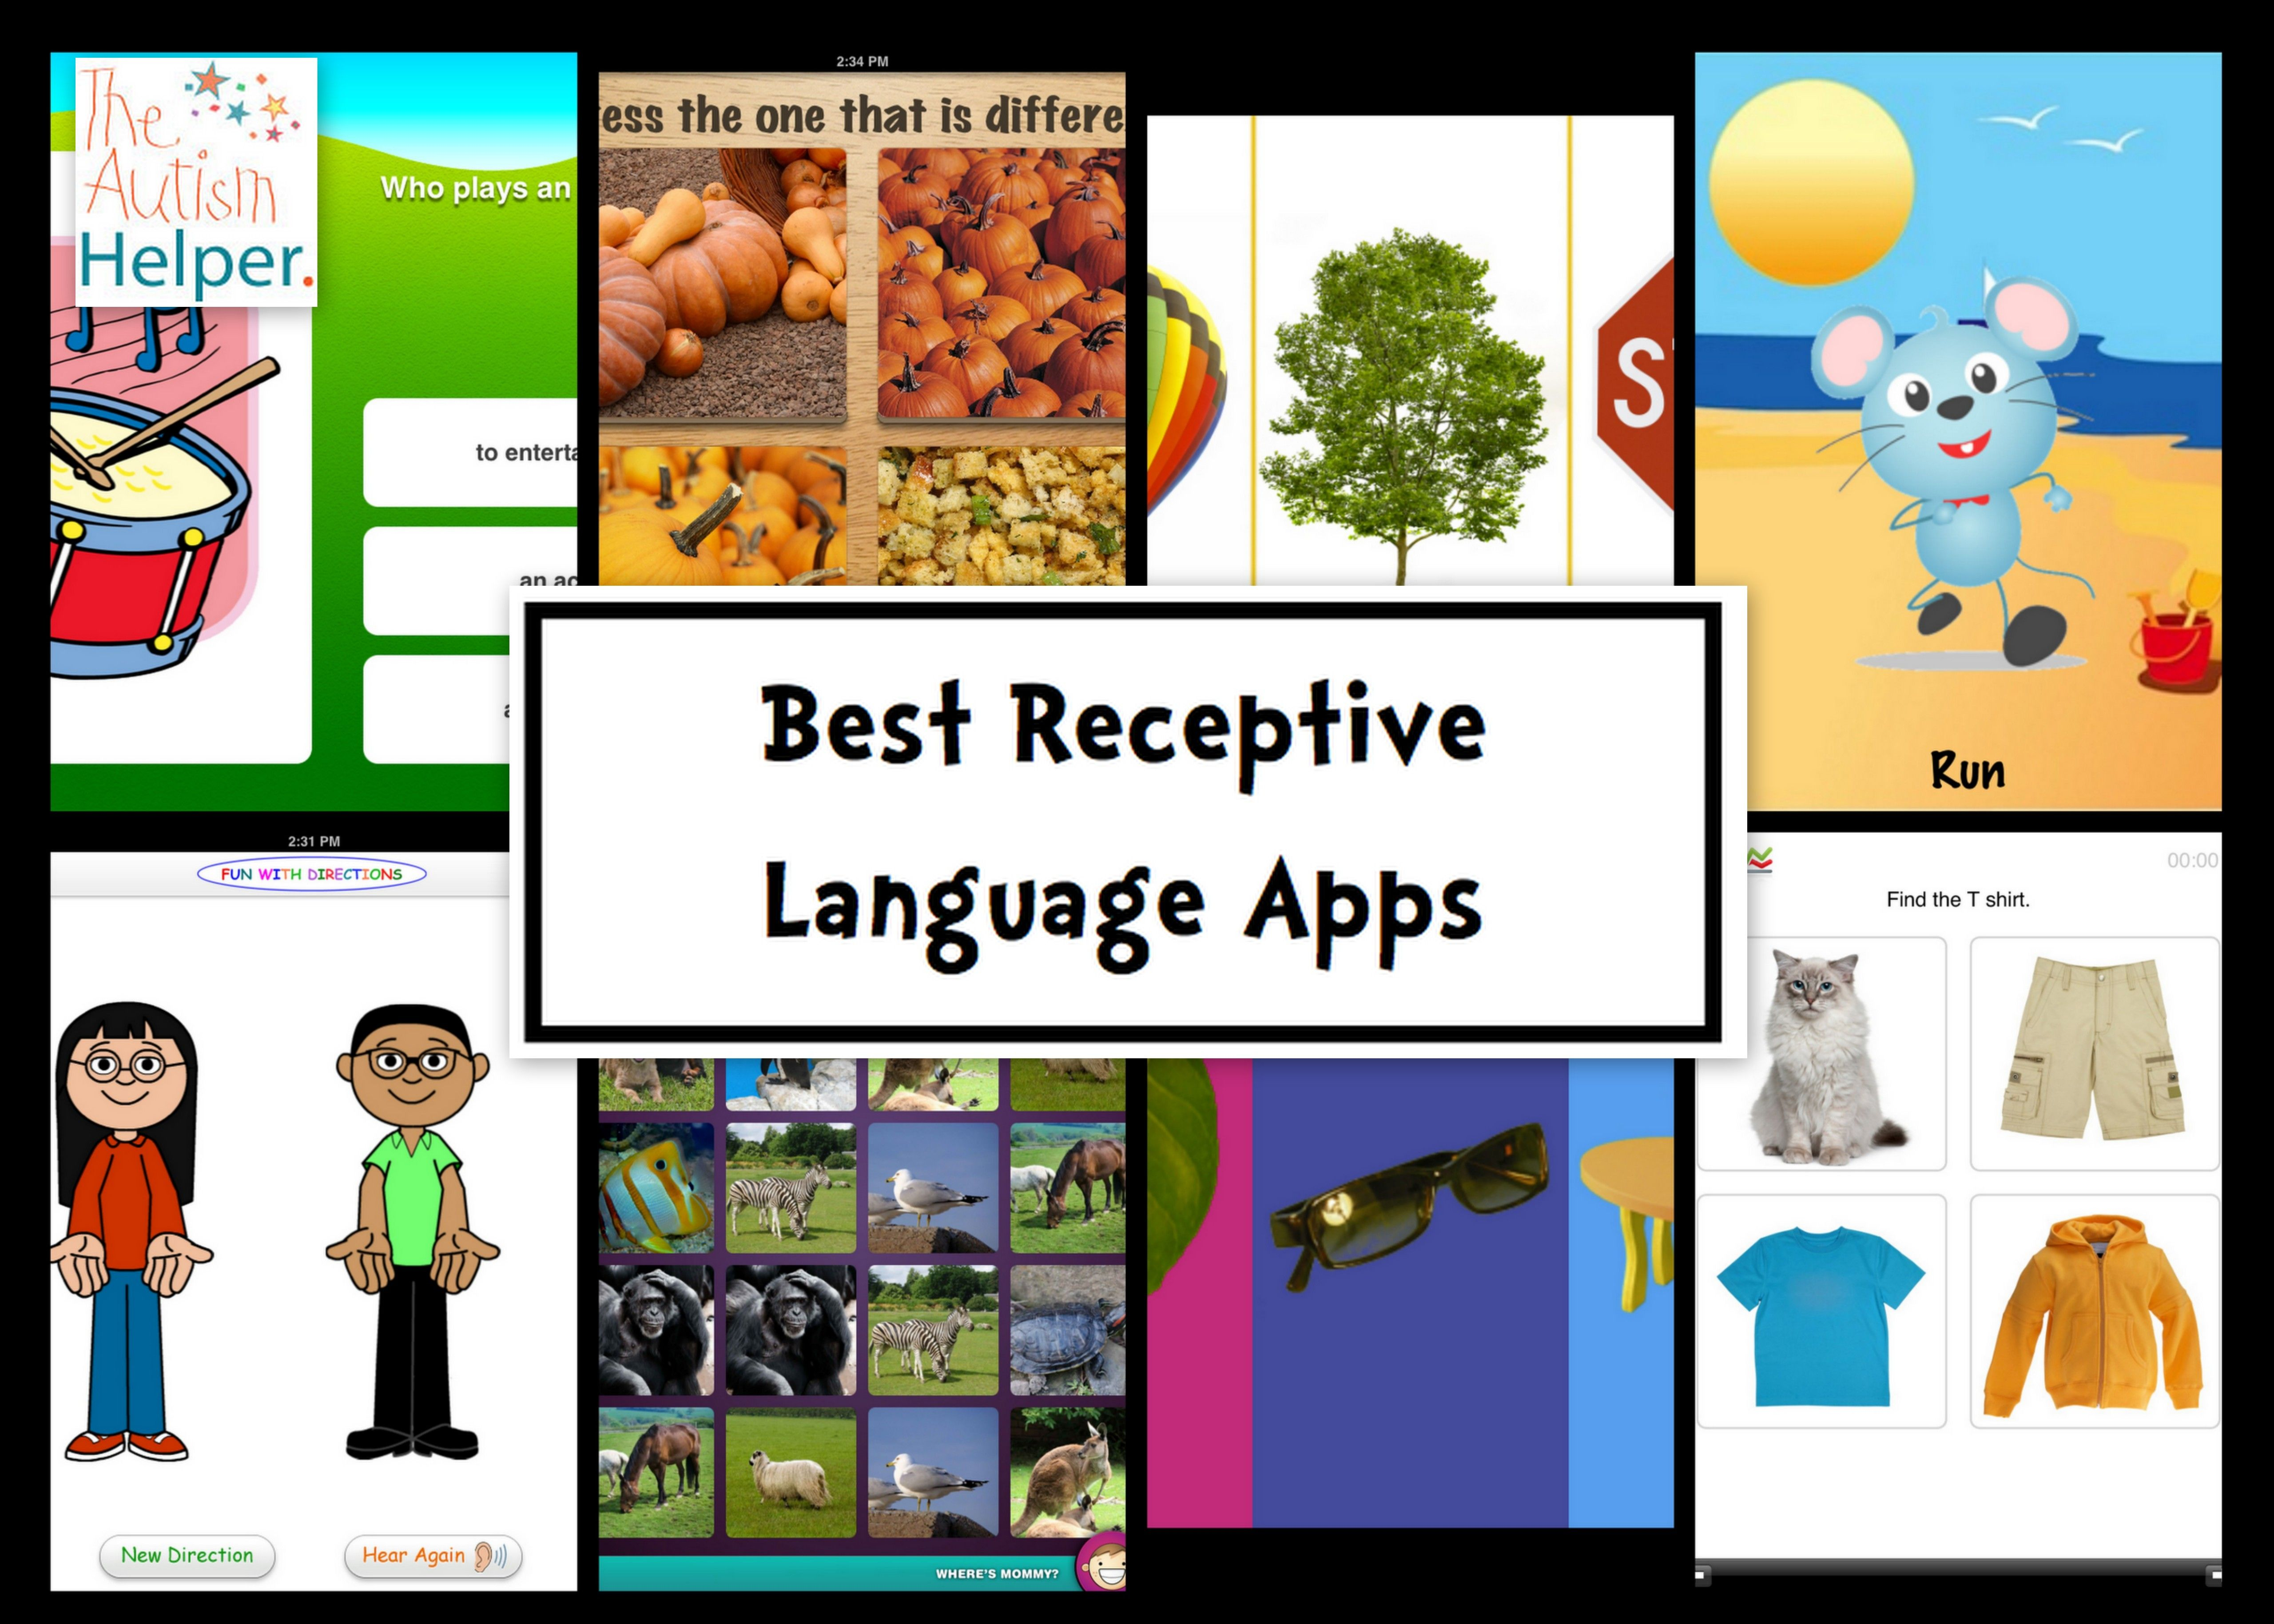 Best Receptive Language Apps